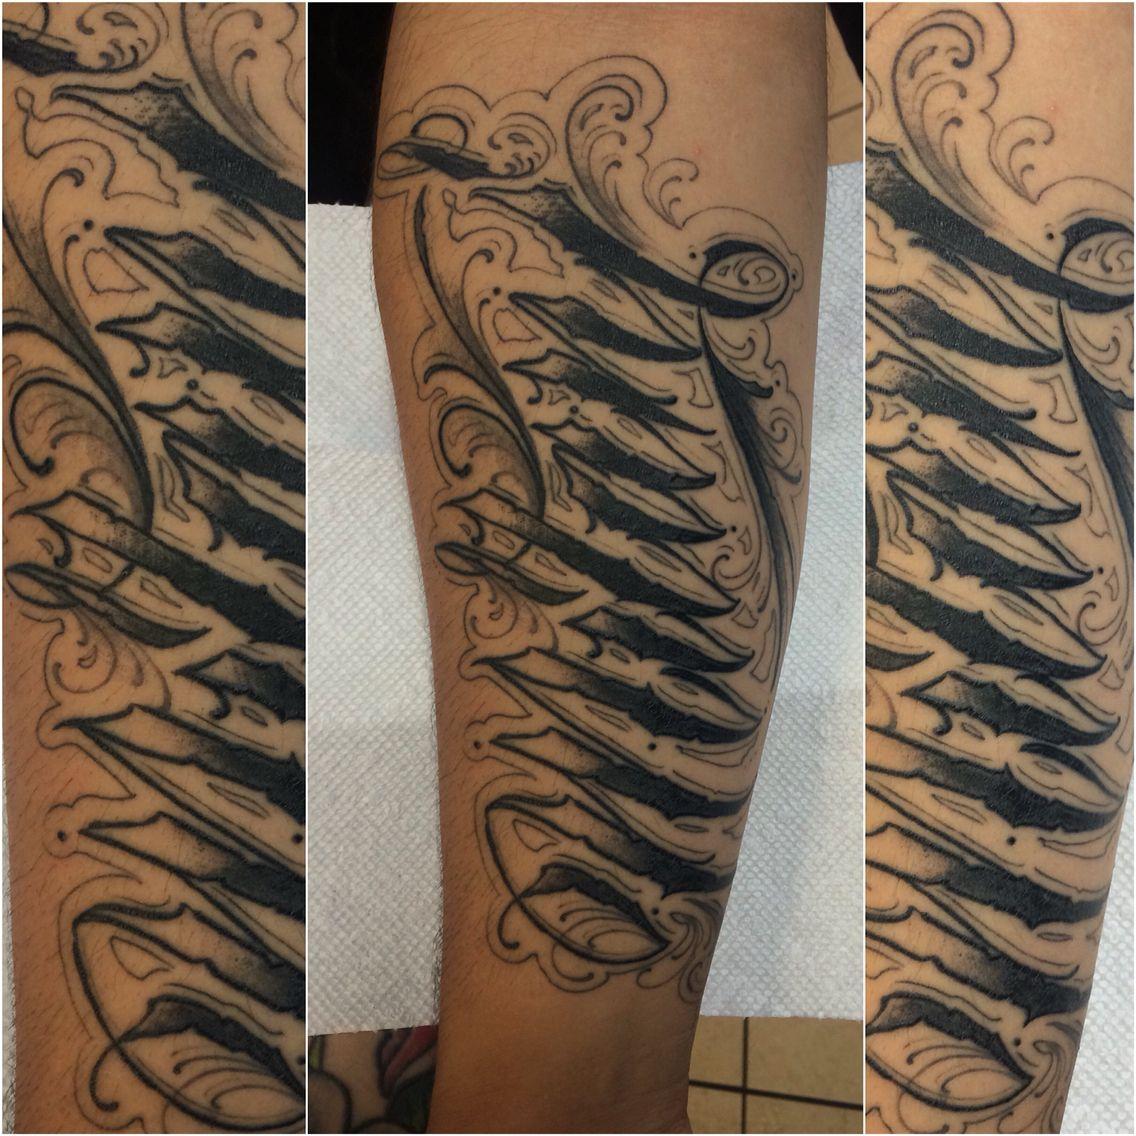 Tattoo by @colorsoner713 Cursive lettering script custom ...